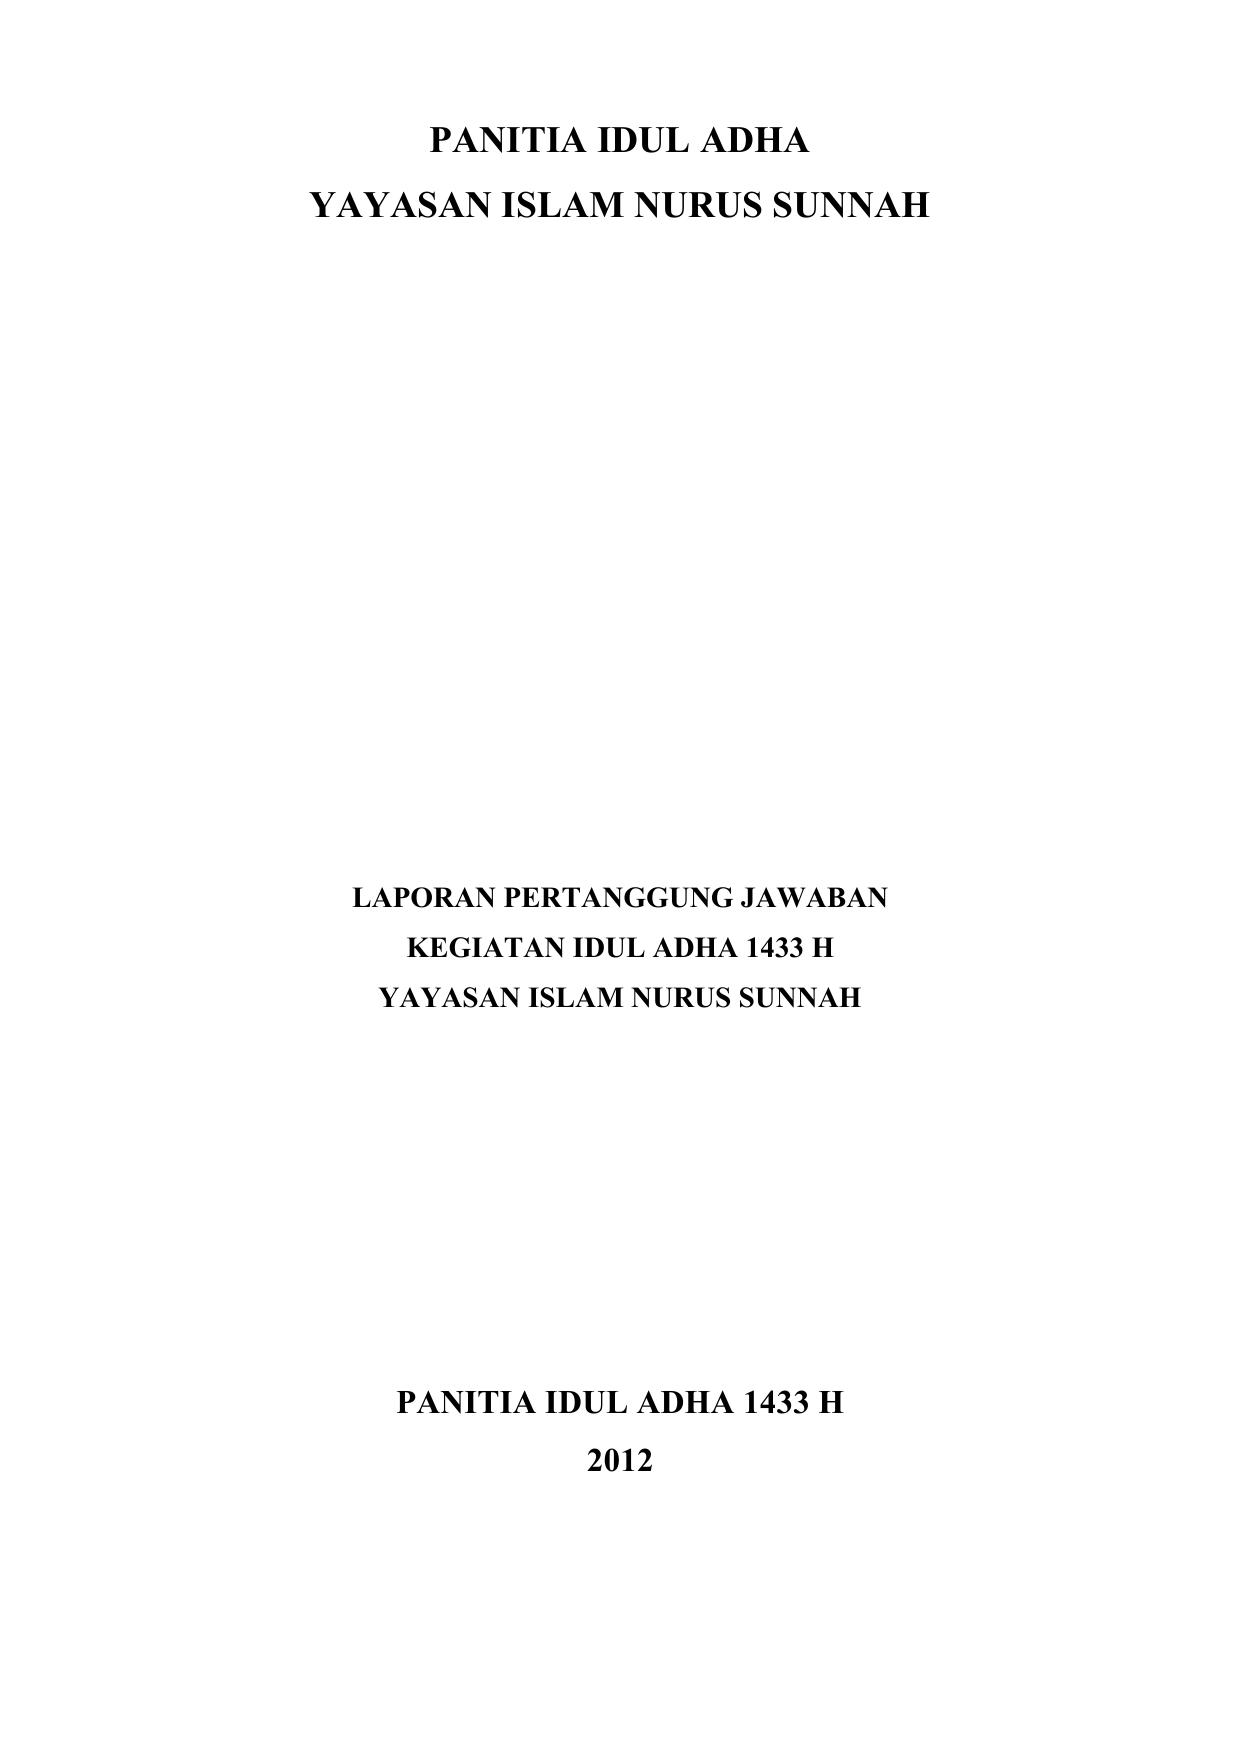 Panitia Idul Adha